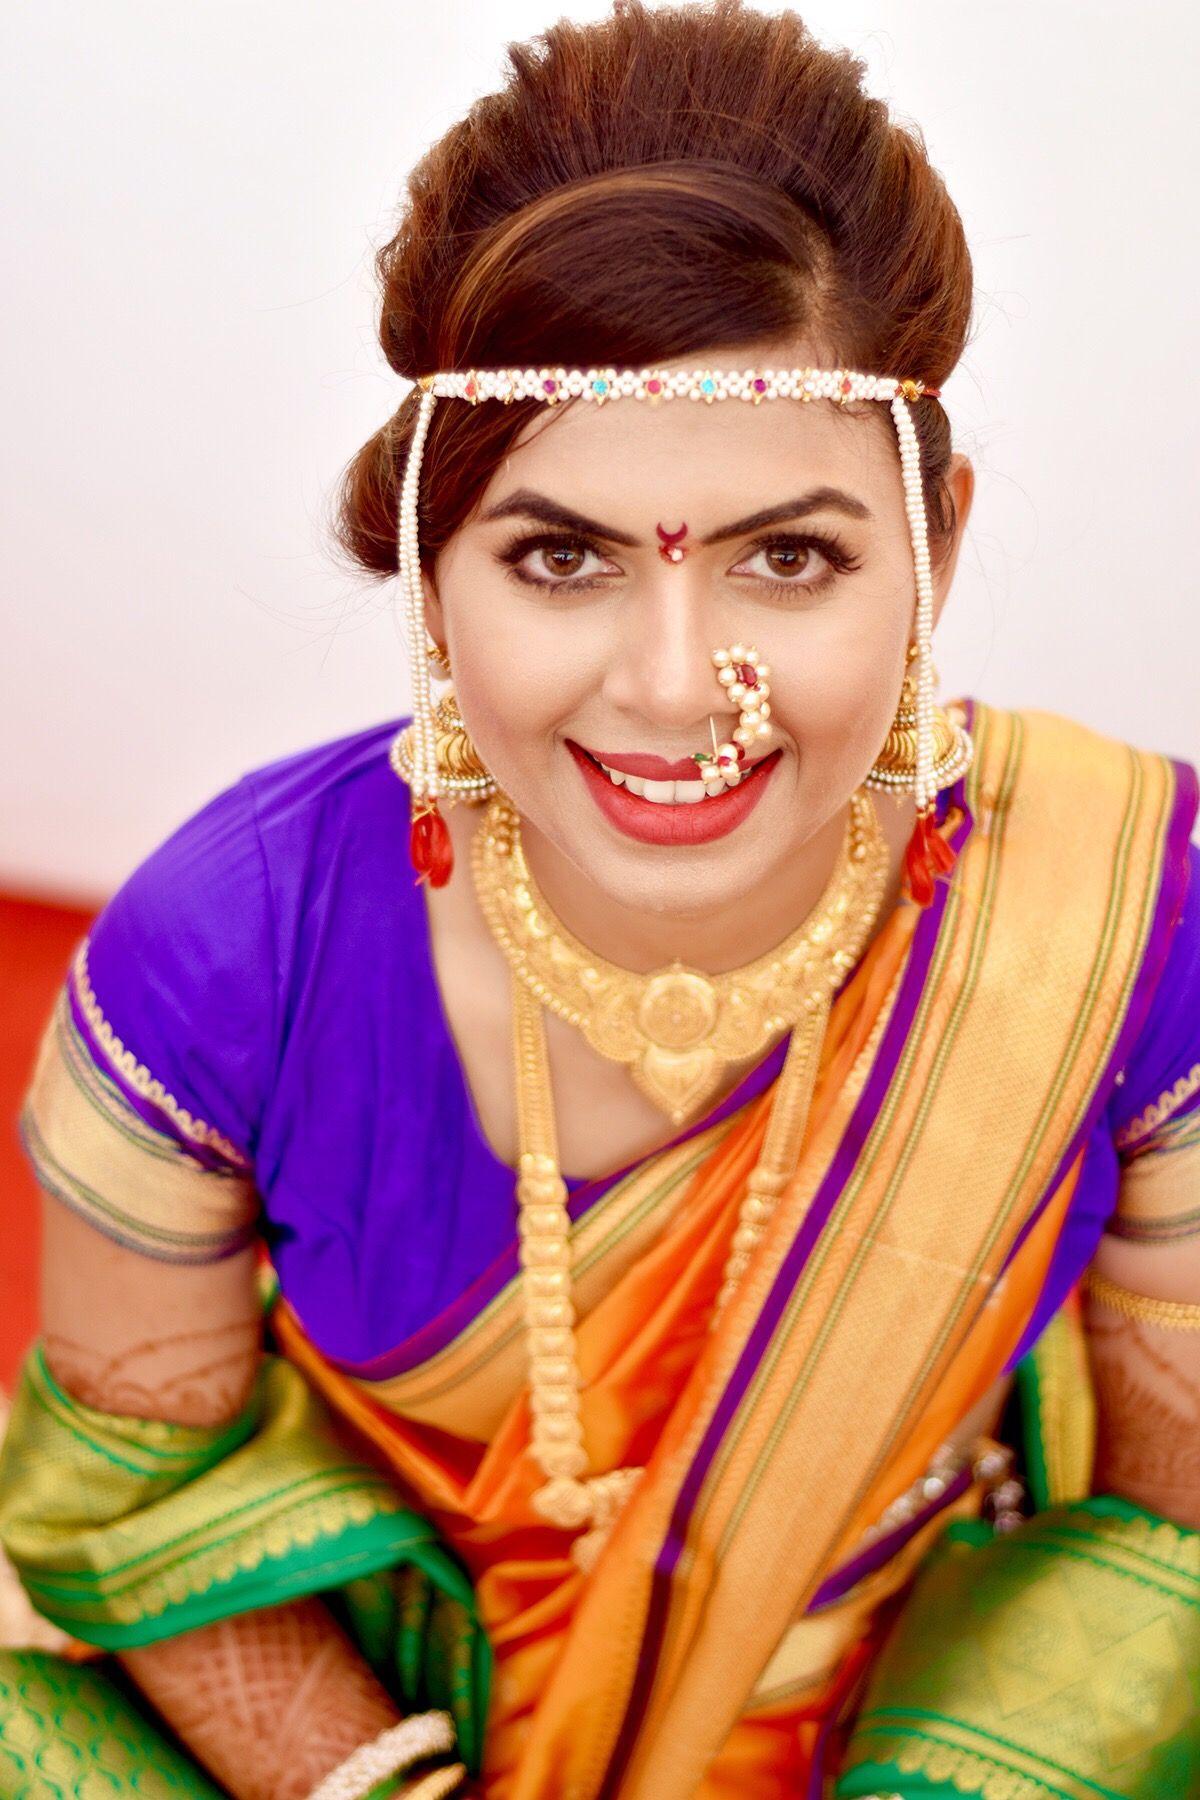 nauvari saree bride #nath #nathni #nosering   maharashtrian